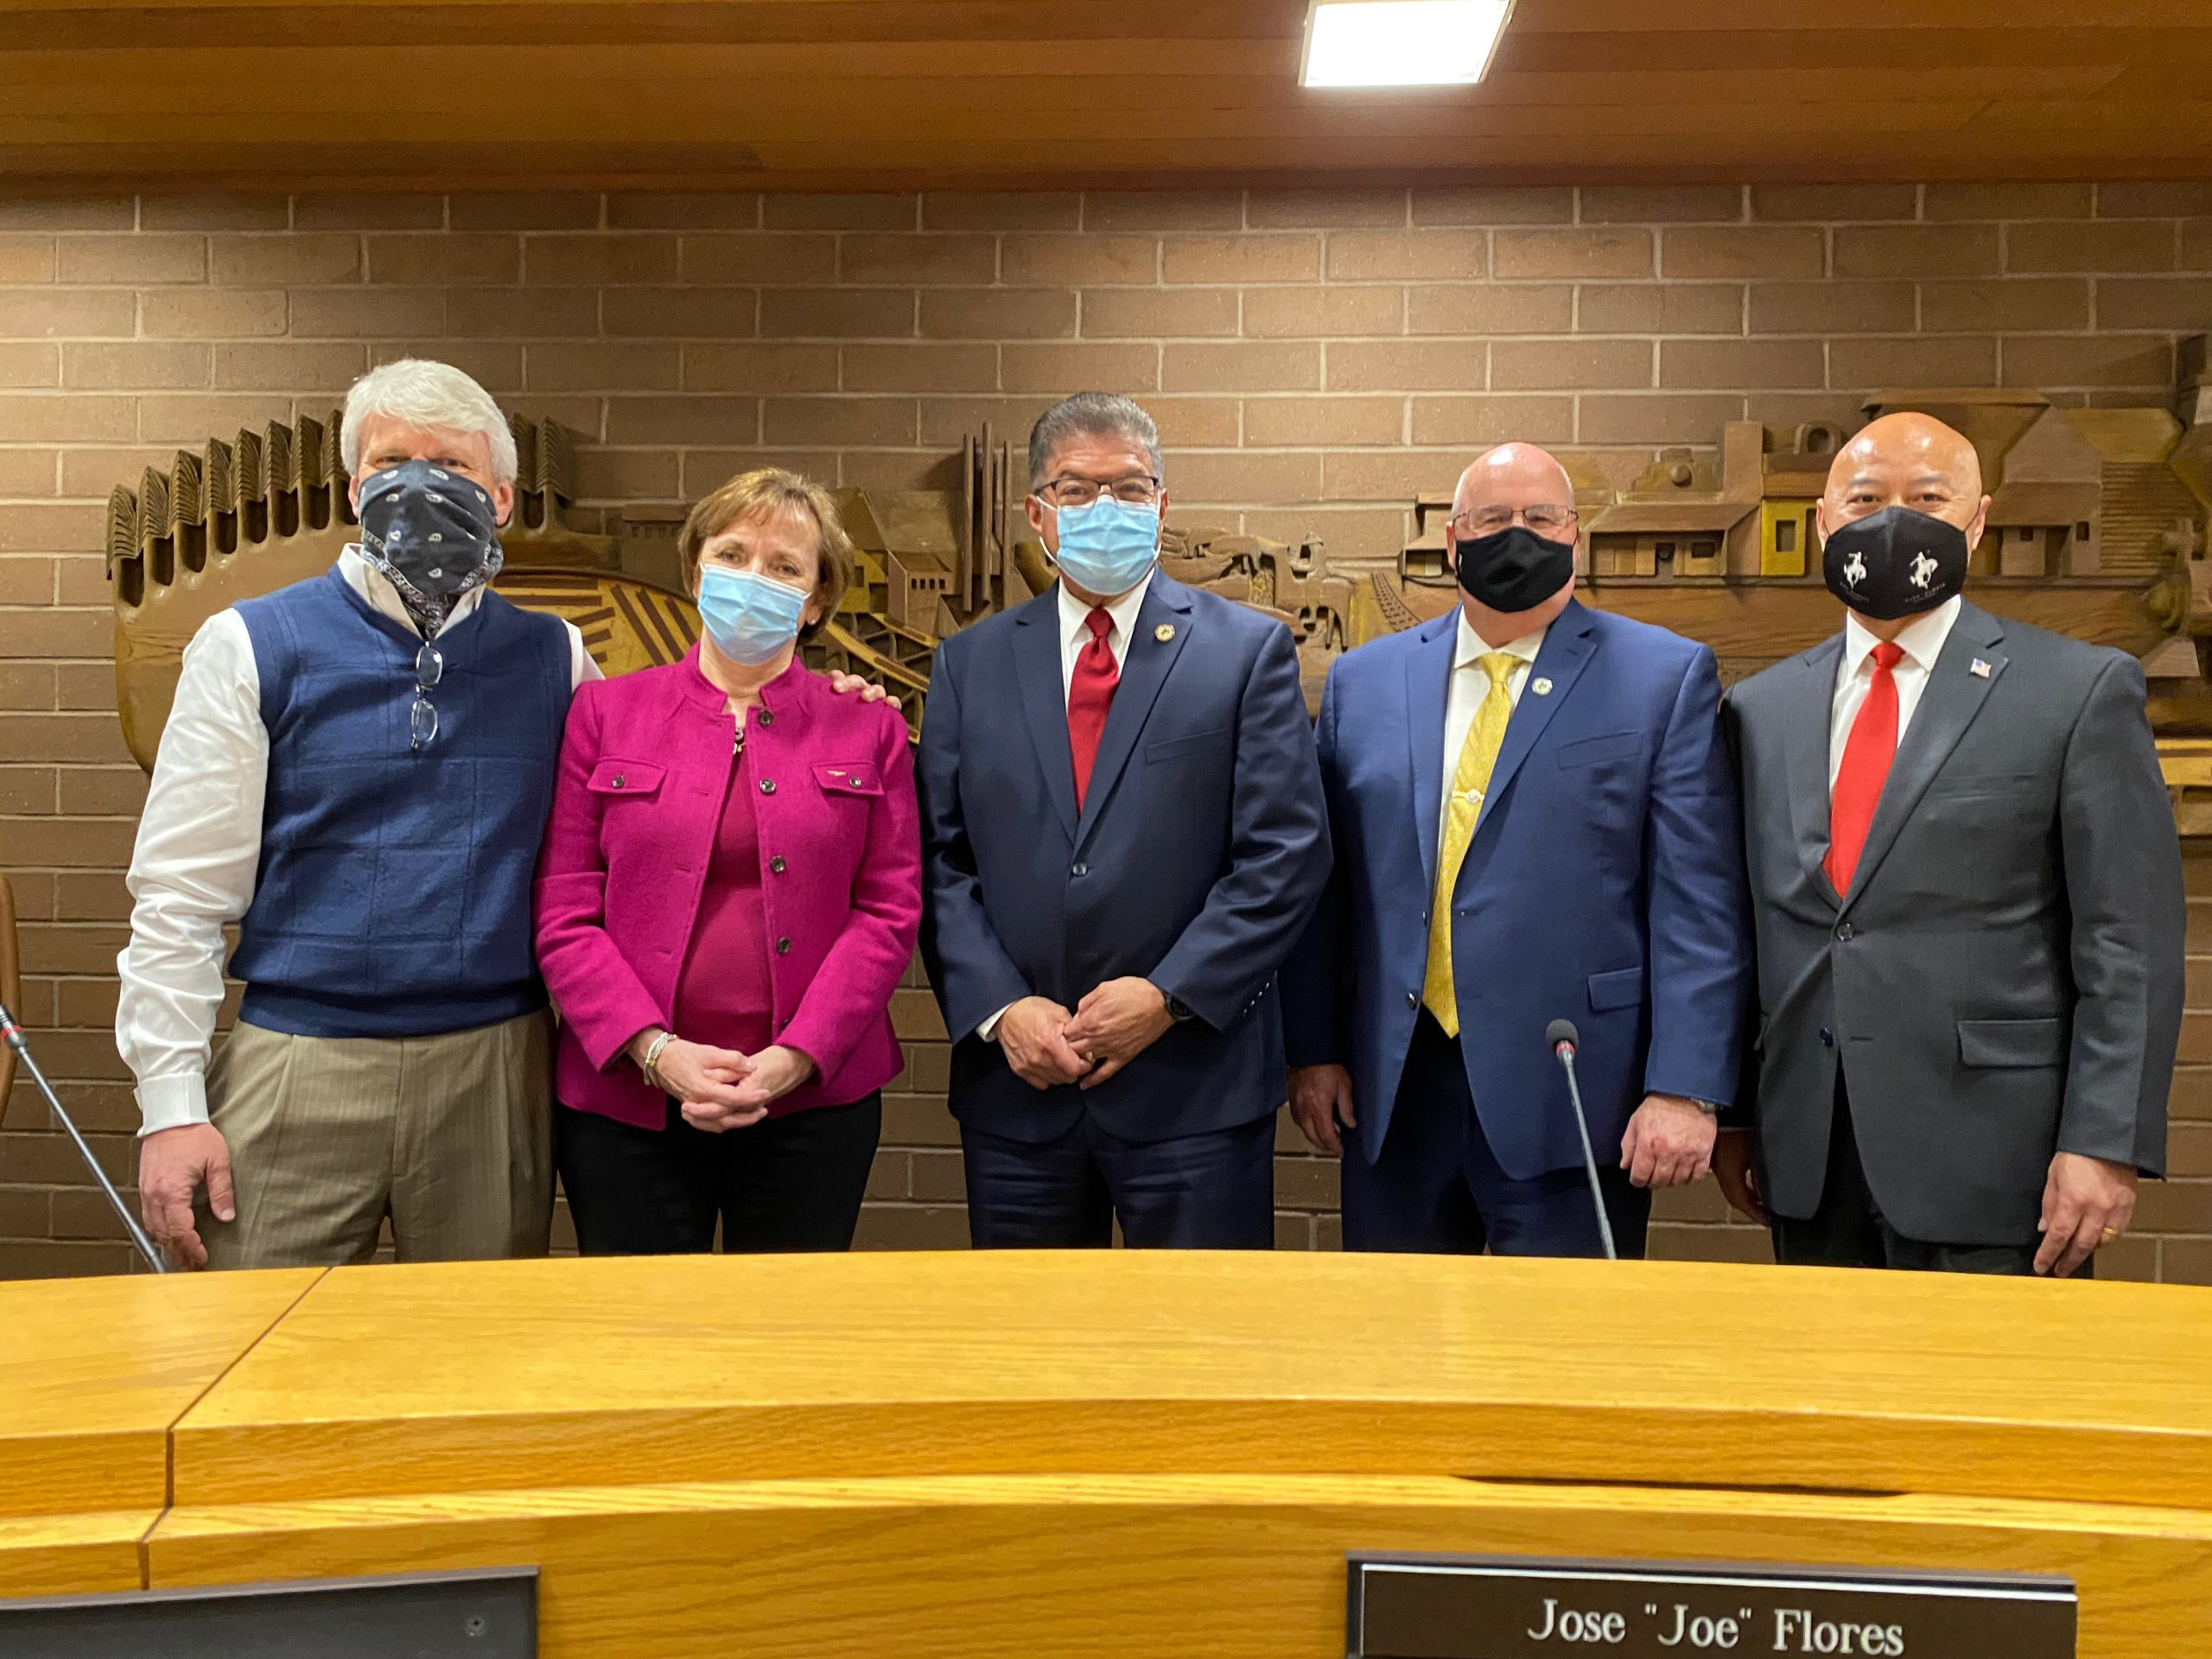 New Clovis City Council sworn-in, new mayor selected